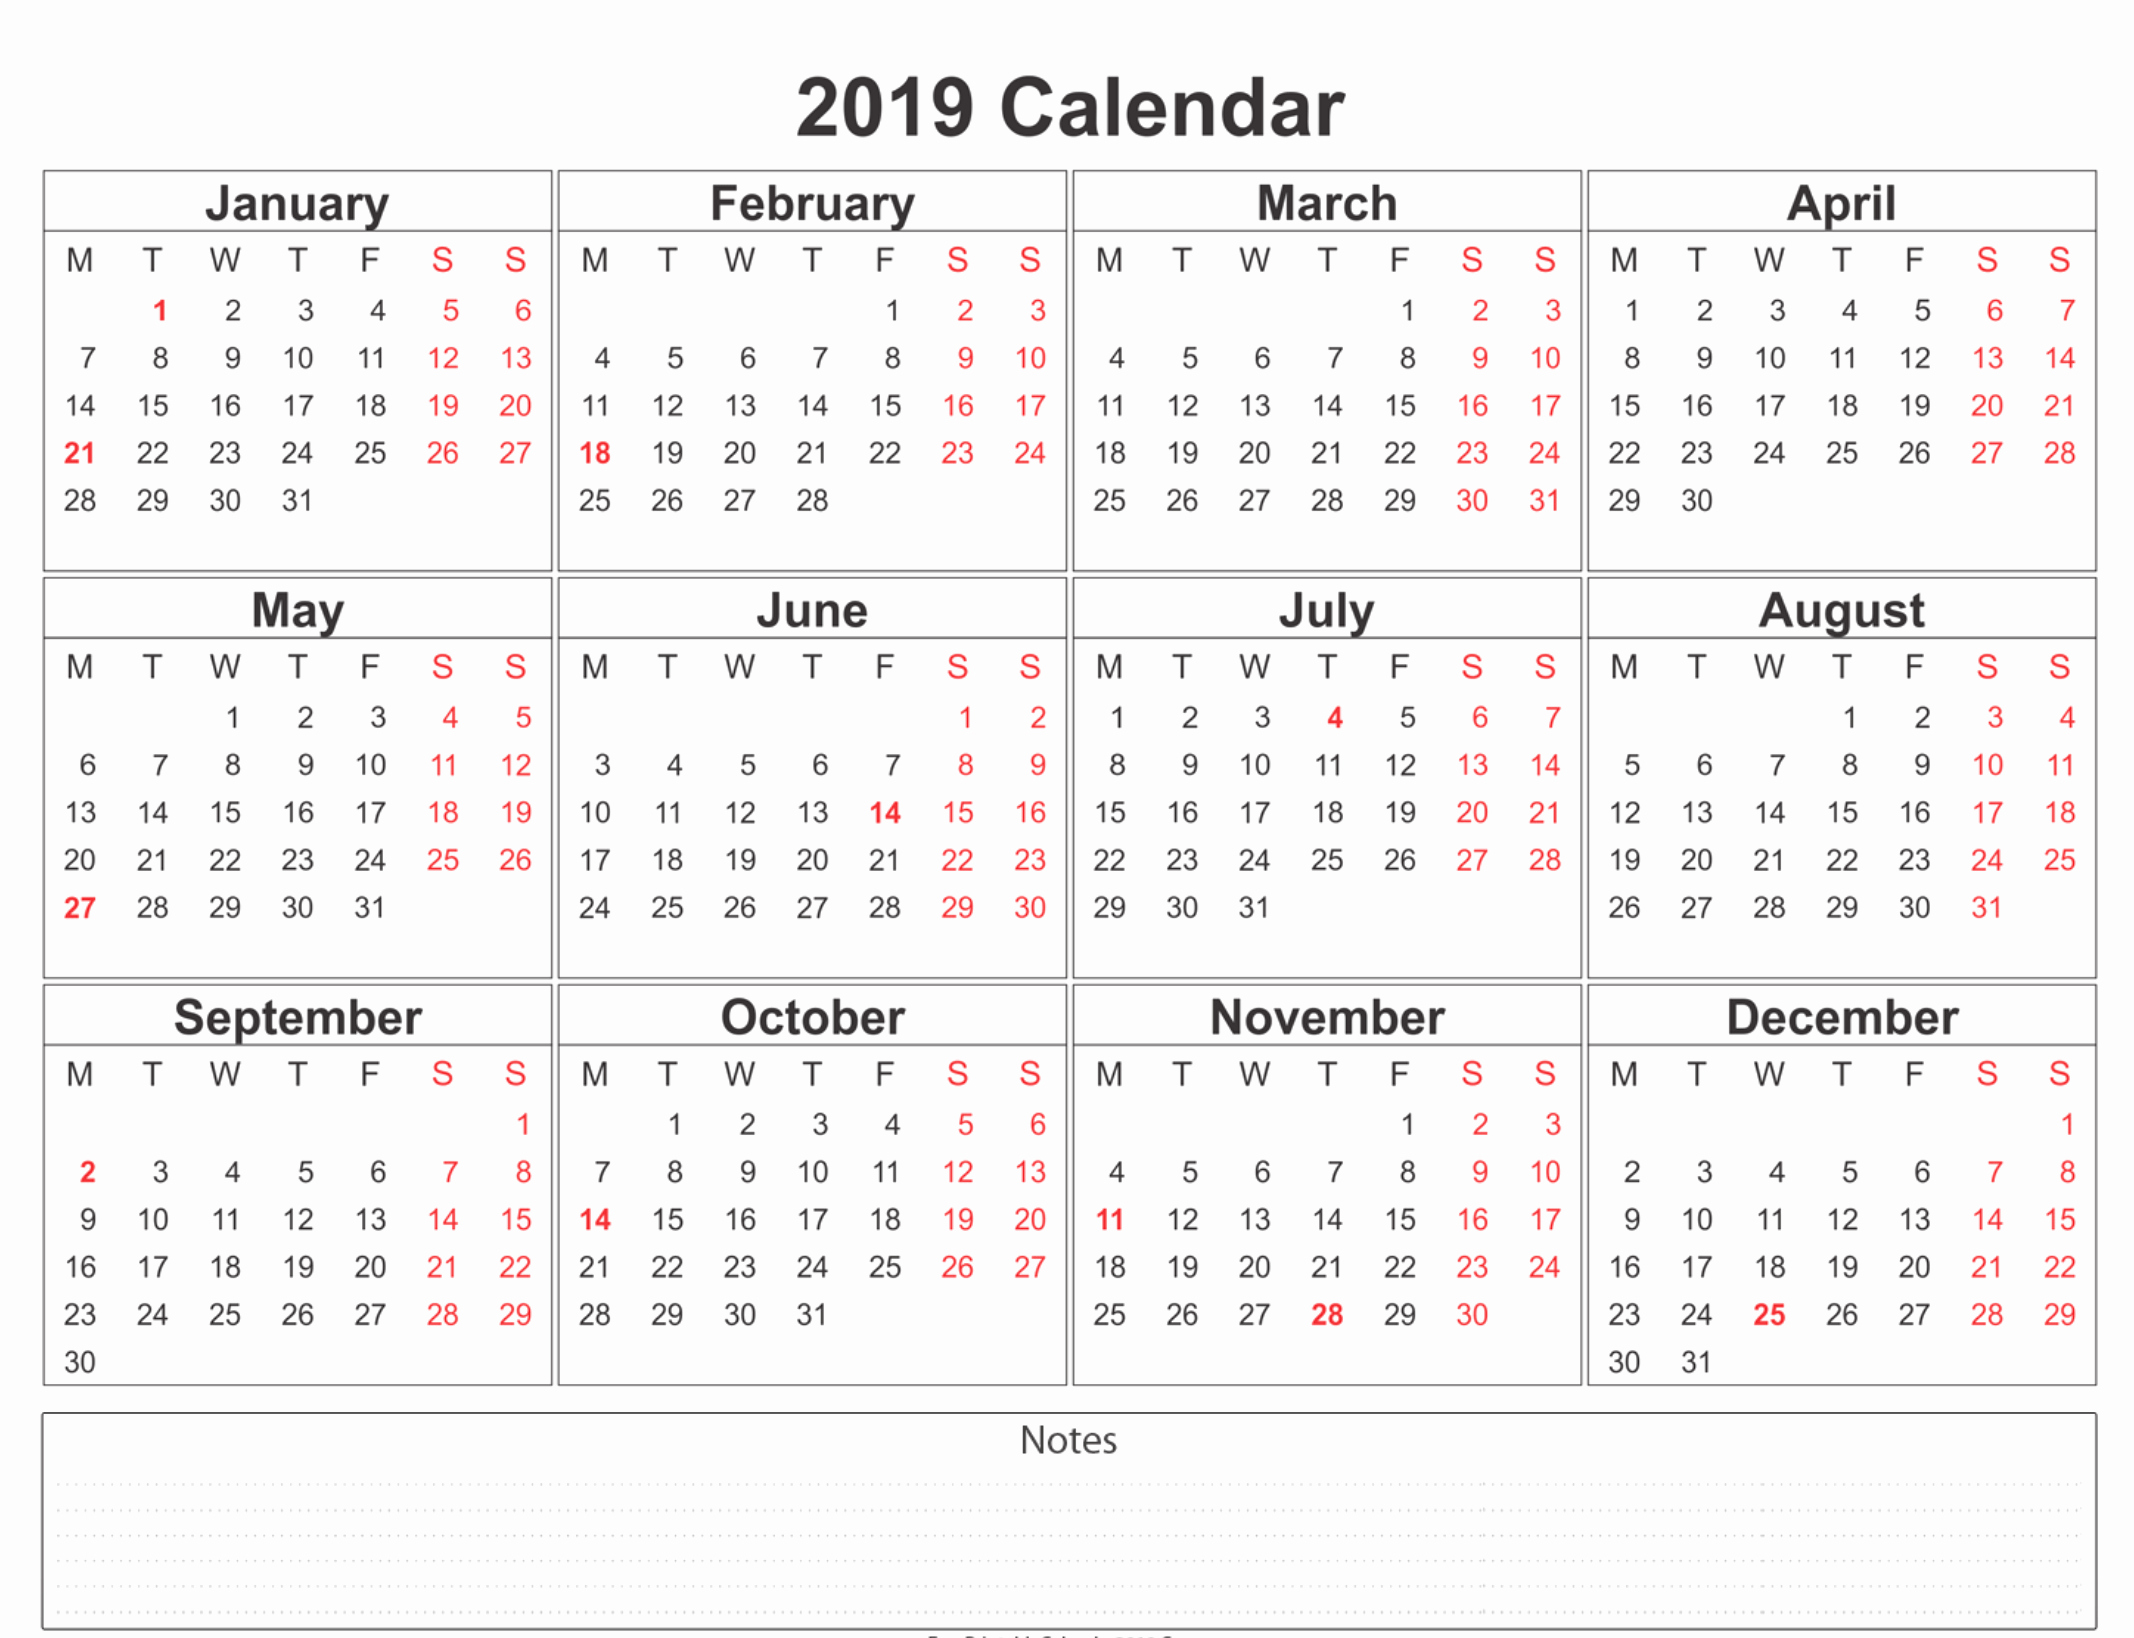 Free Monthly Calendar Template 2019 Best Of 2019 Calendar Amazonaws